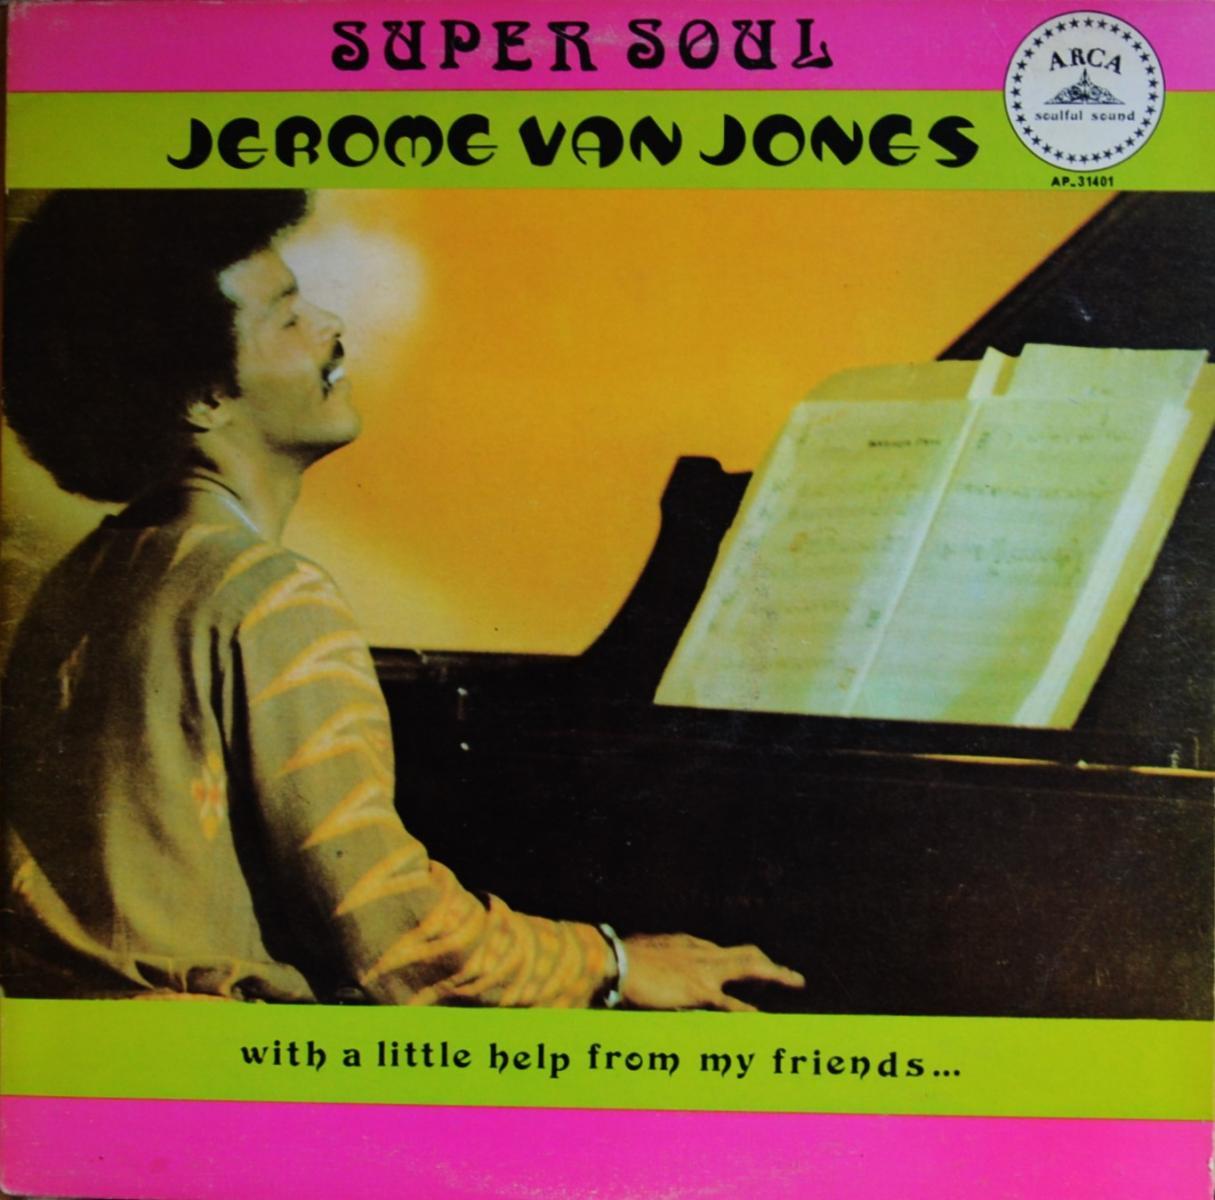 JEROME VAN JONES / A LITTLE HELP FROM MY FRIENDS (LP)